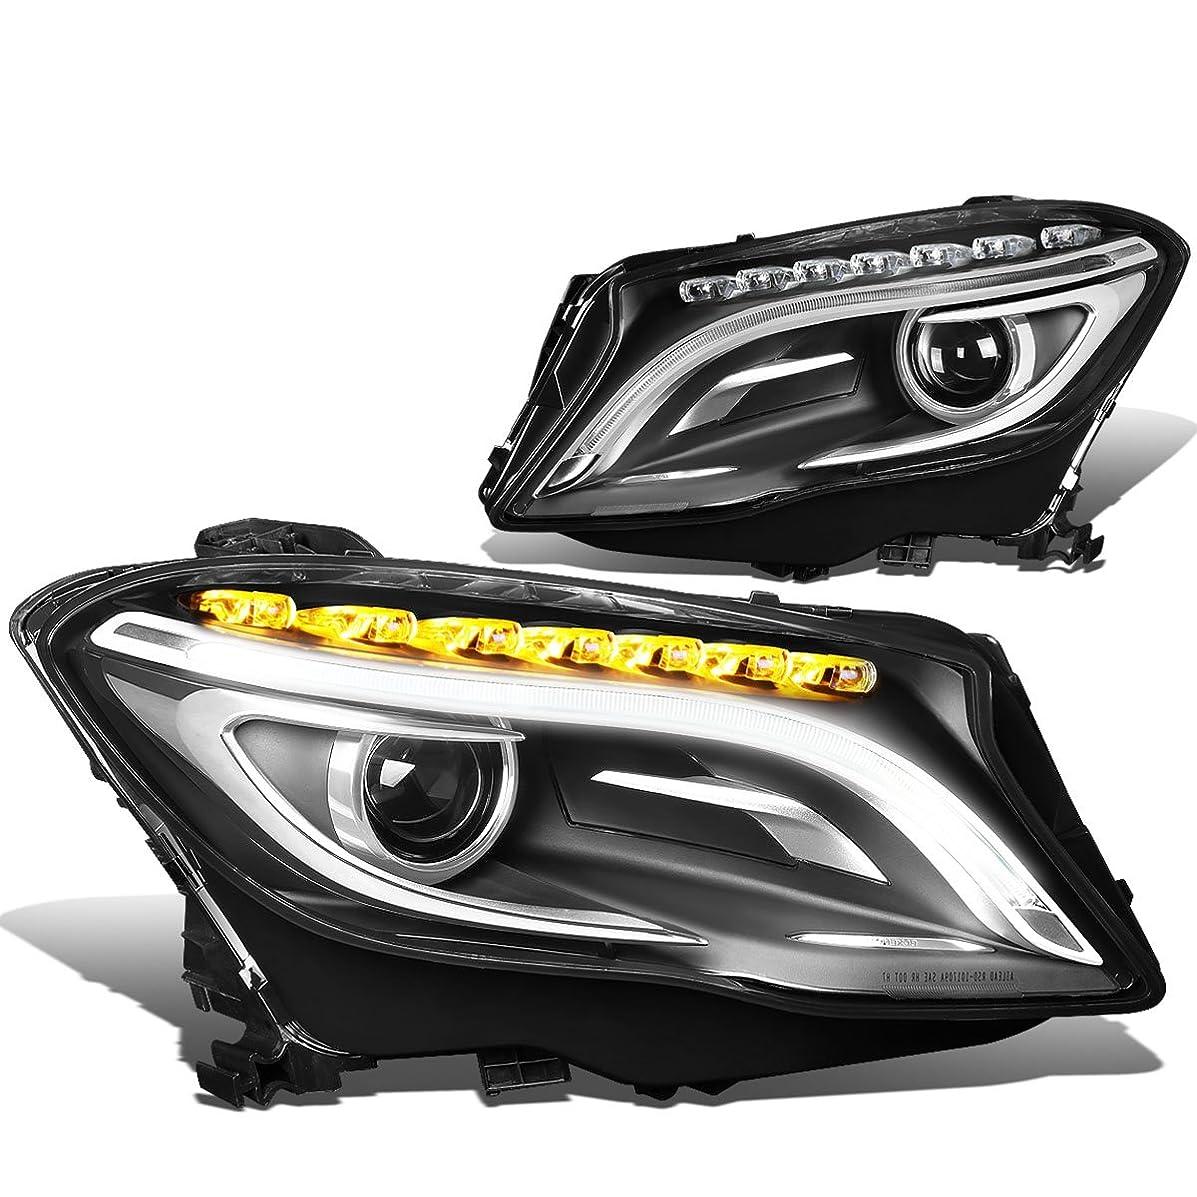 DNA Motoring HL-HPL-GLAX156-CH Pair of Headlight Assembly [14-17 Mercedes GLA-Class]